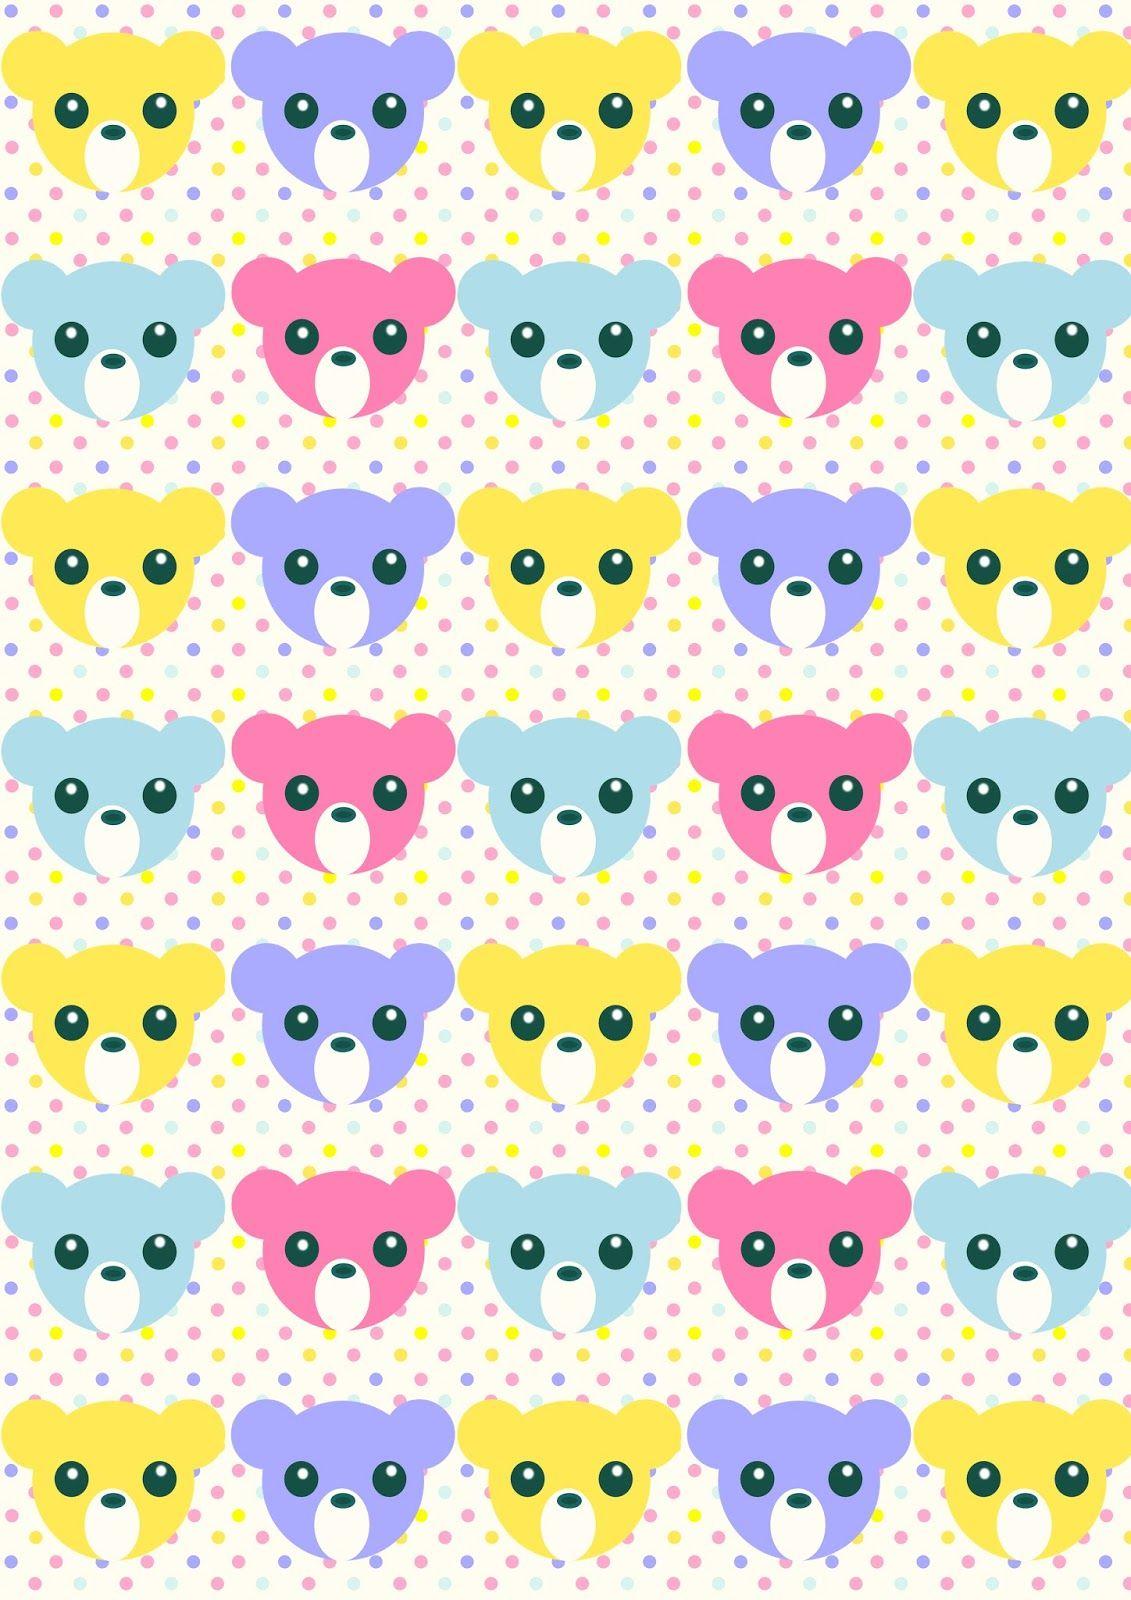 Scrapbook paper kawaii - Free Printable Nursery Pattern Paper Pastelcolored Babycolors